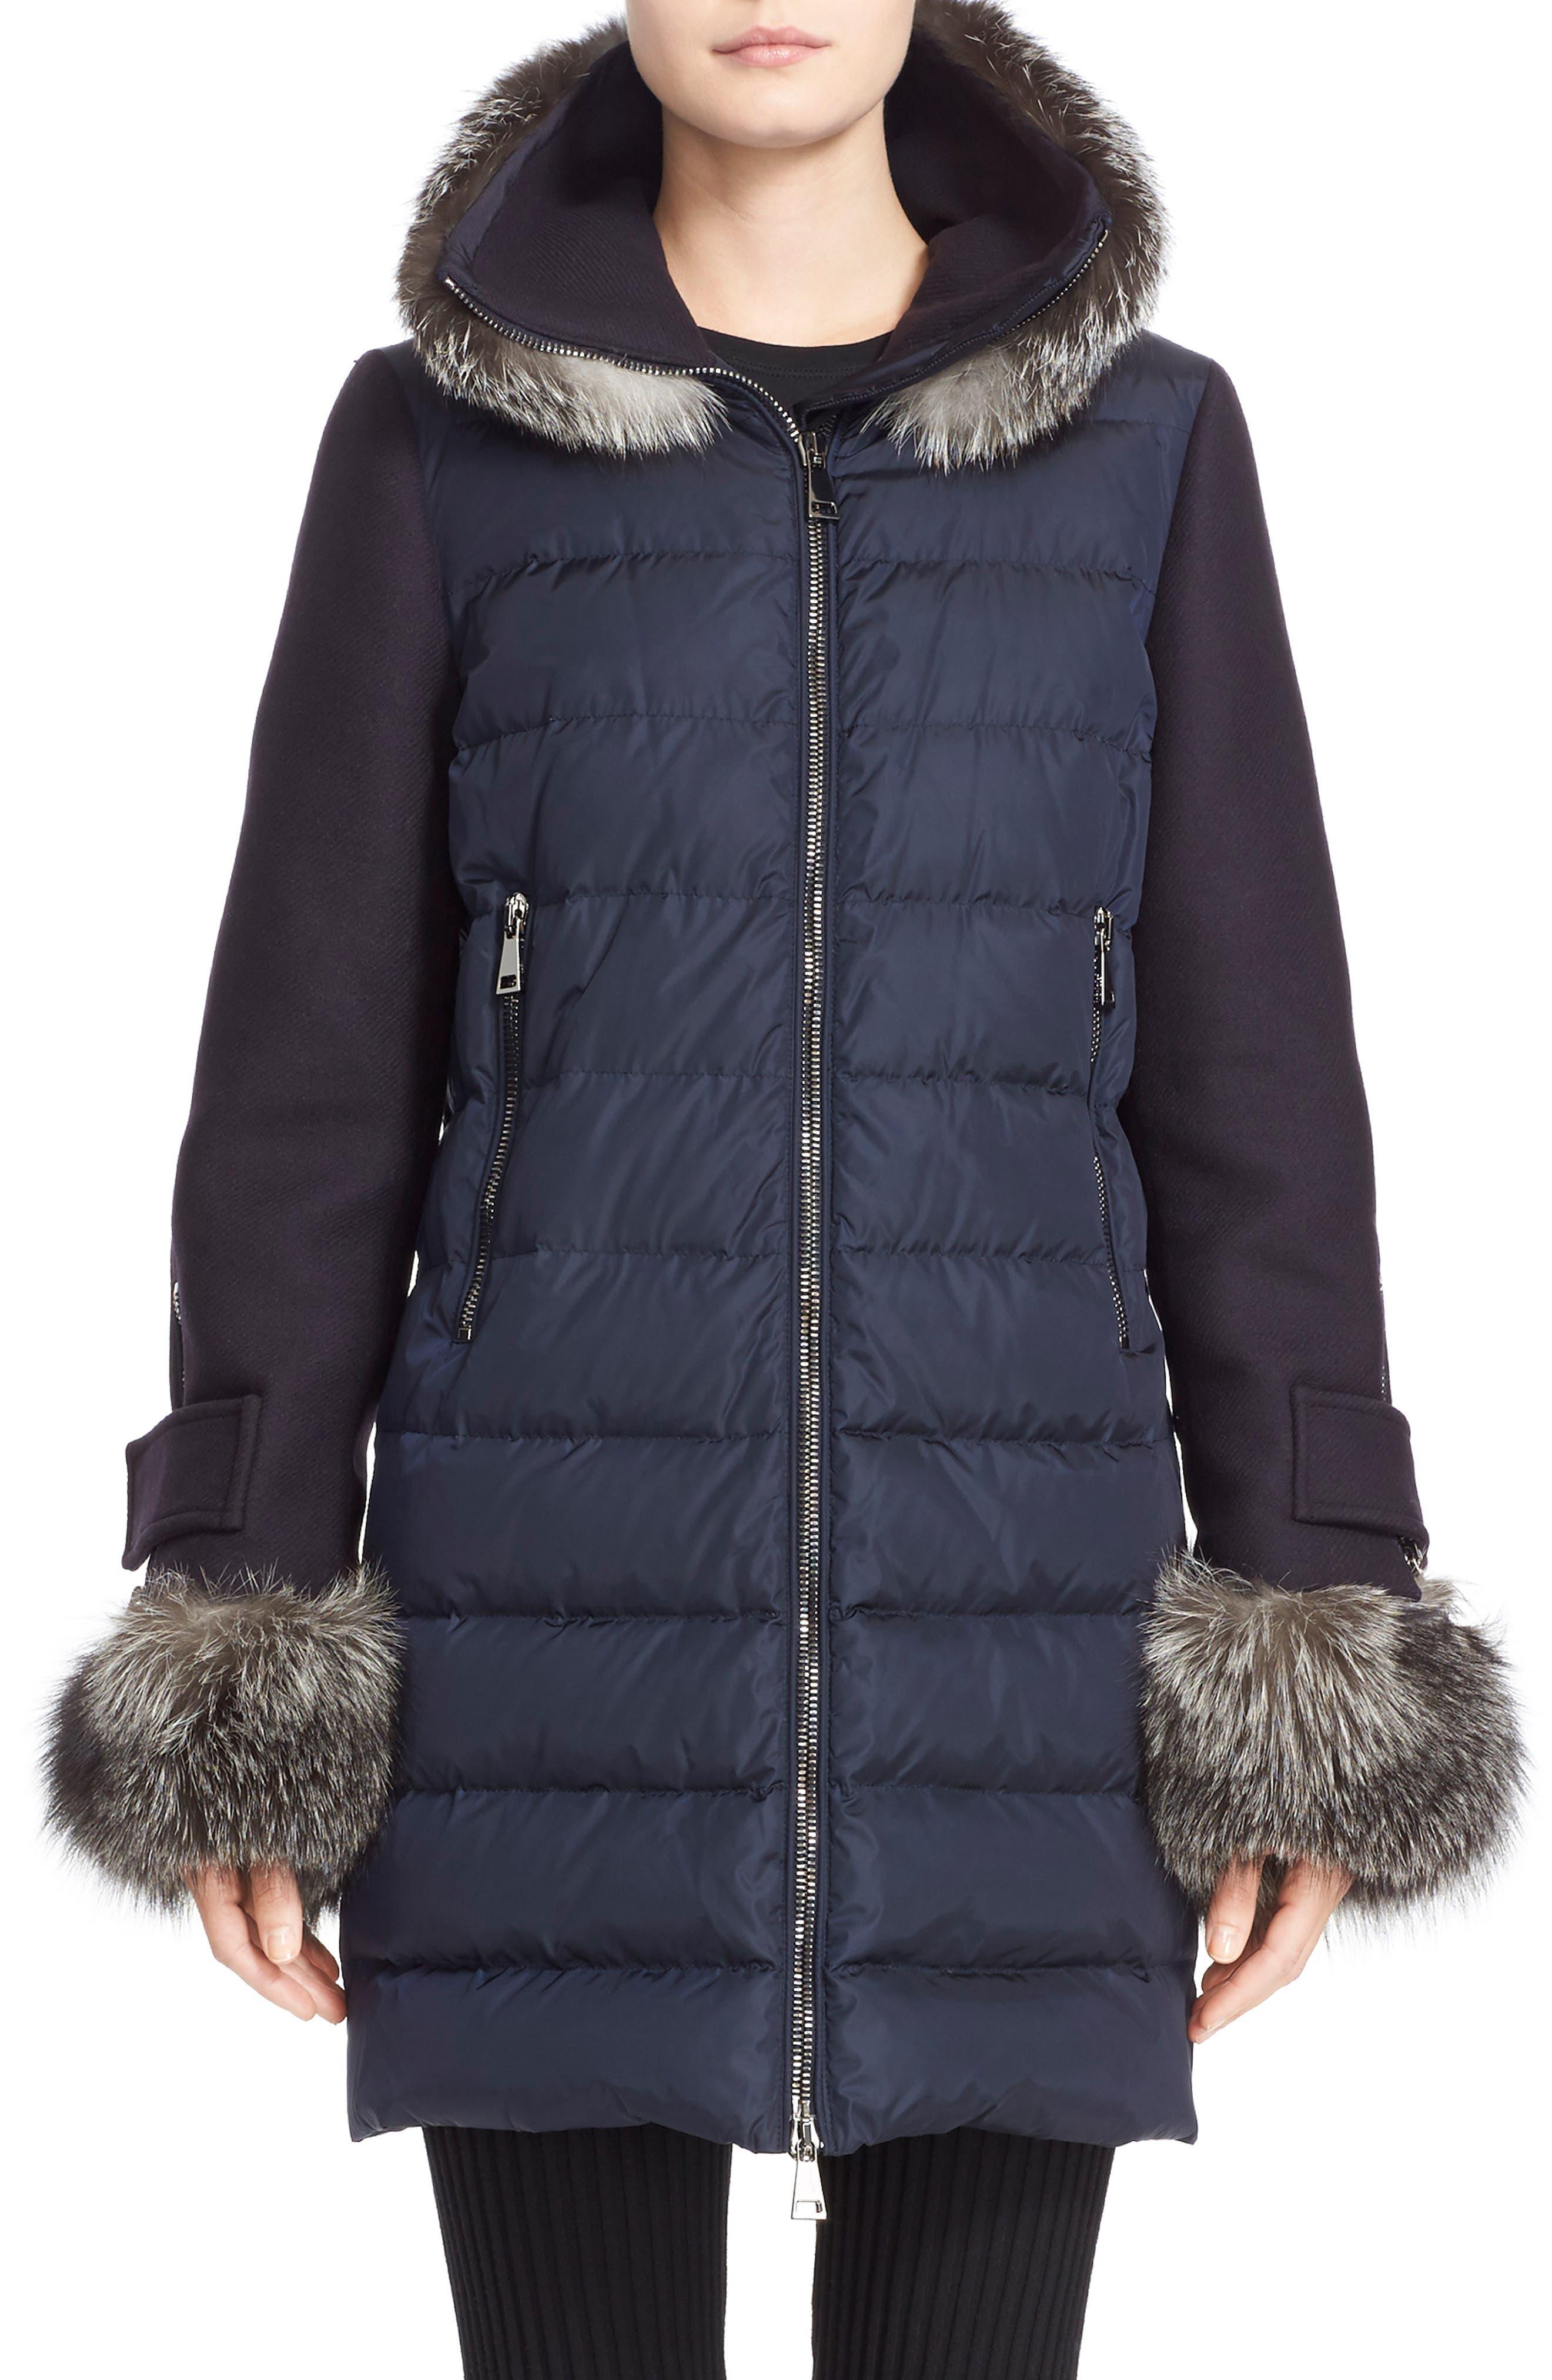 'Elestoria' Two-Piece Down Puffer Coat with Genuine Fox Fur Trim, Main, color, 419